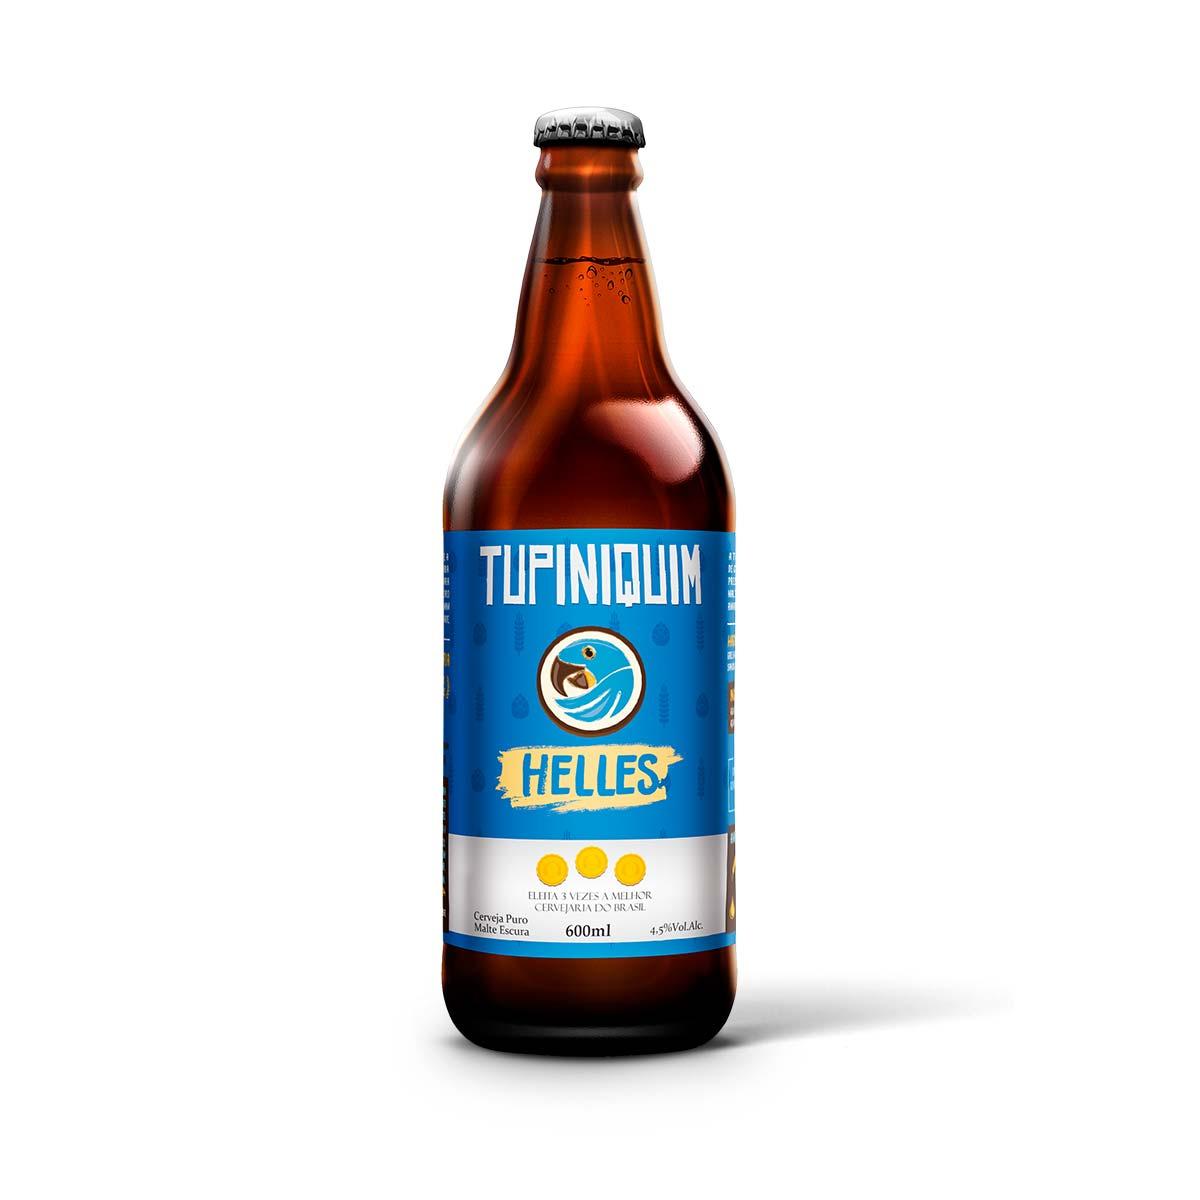 Tupiniquim Helles 600ml